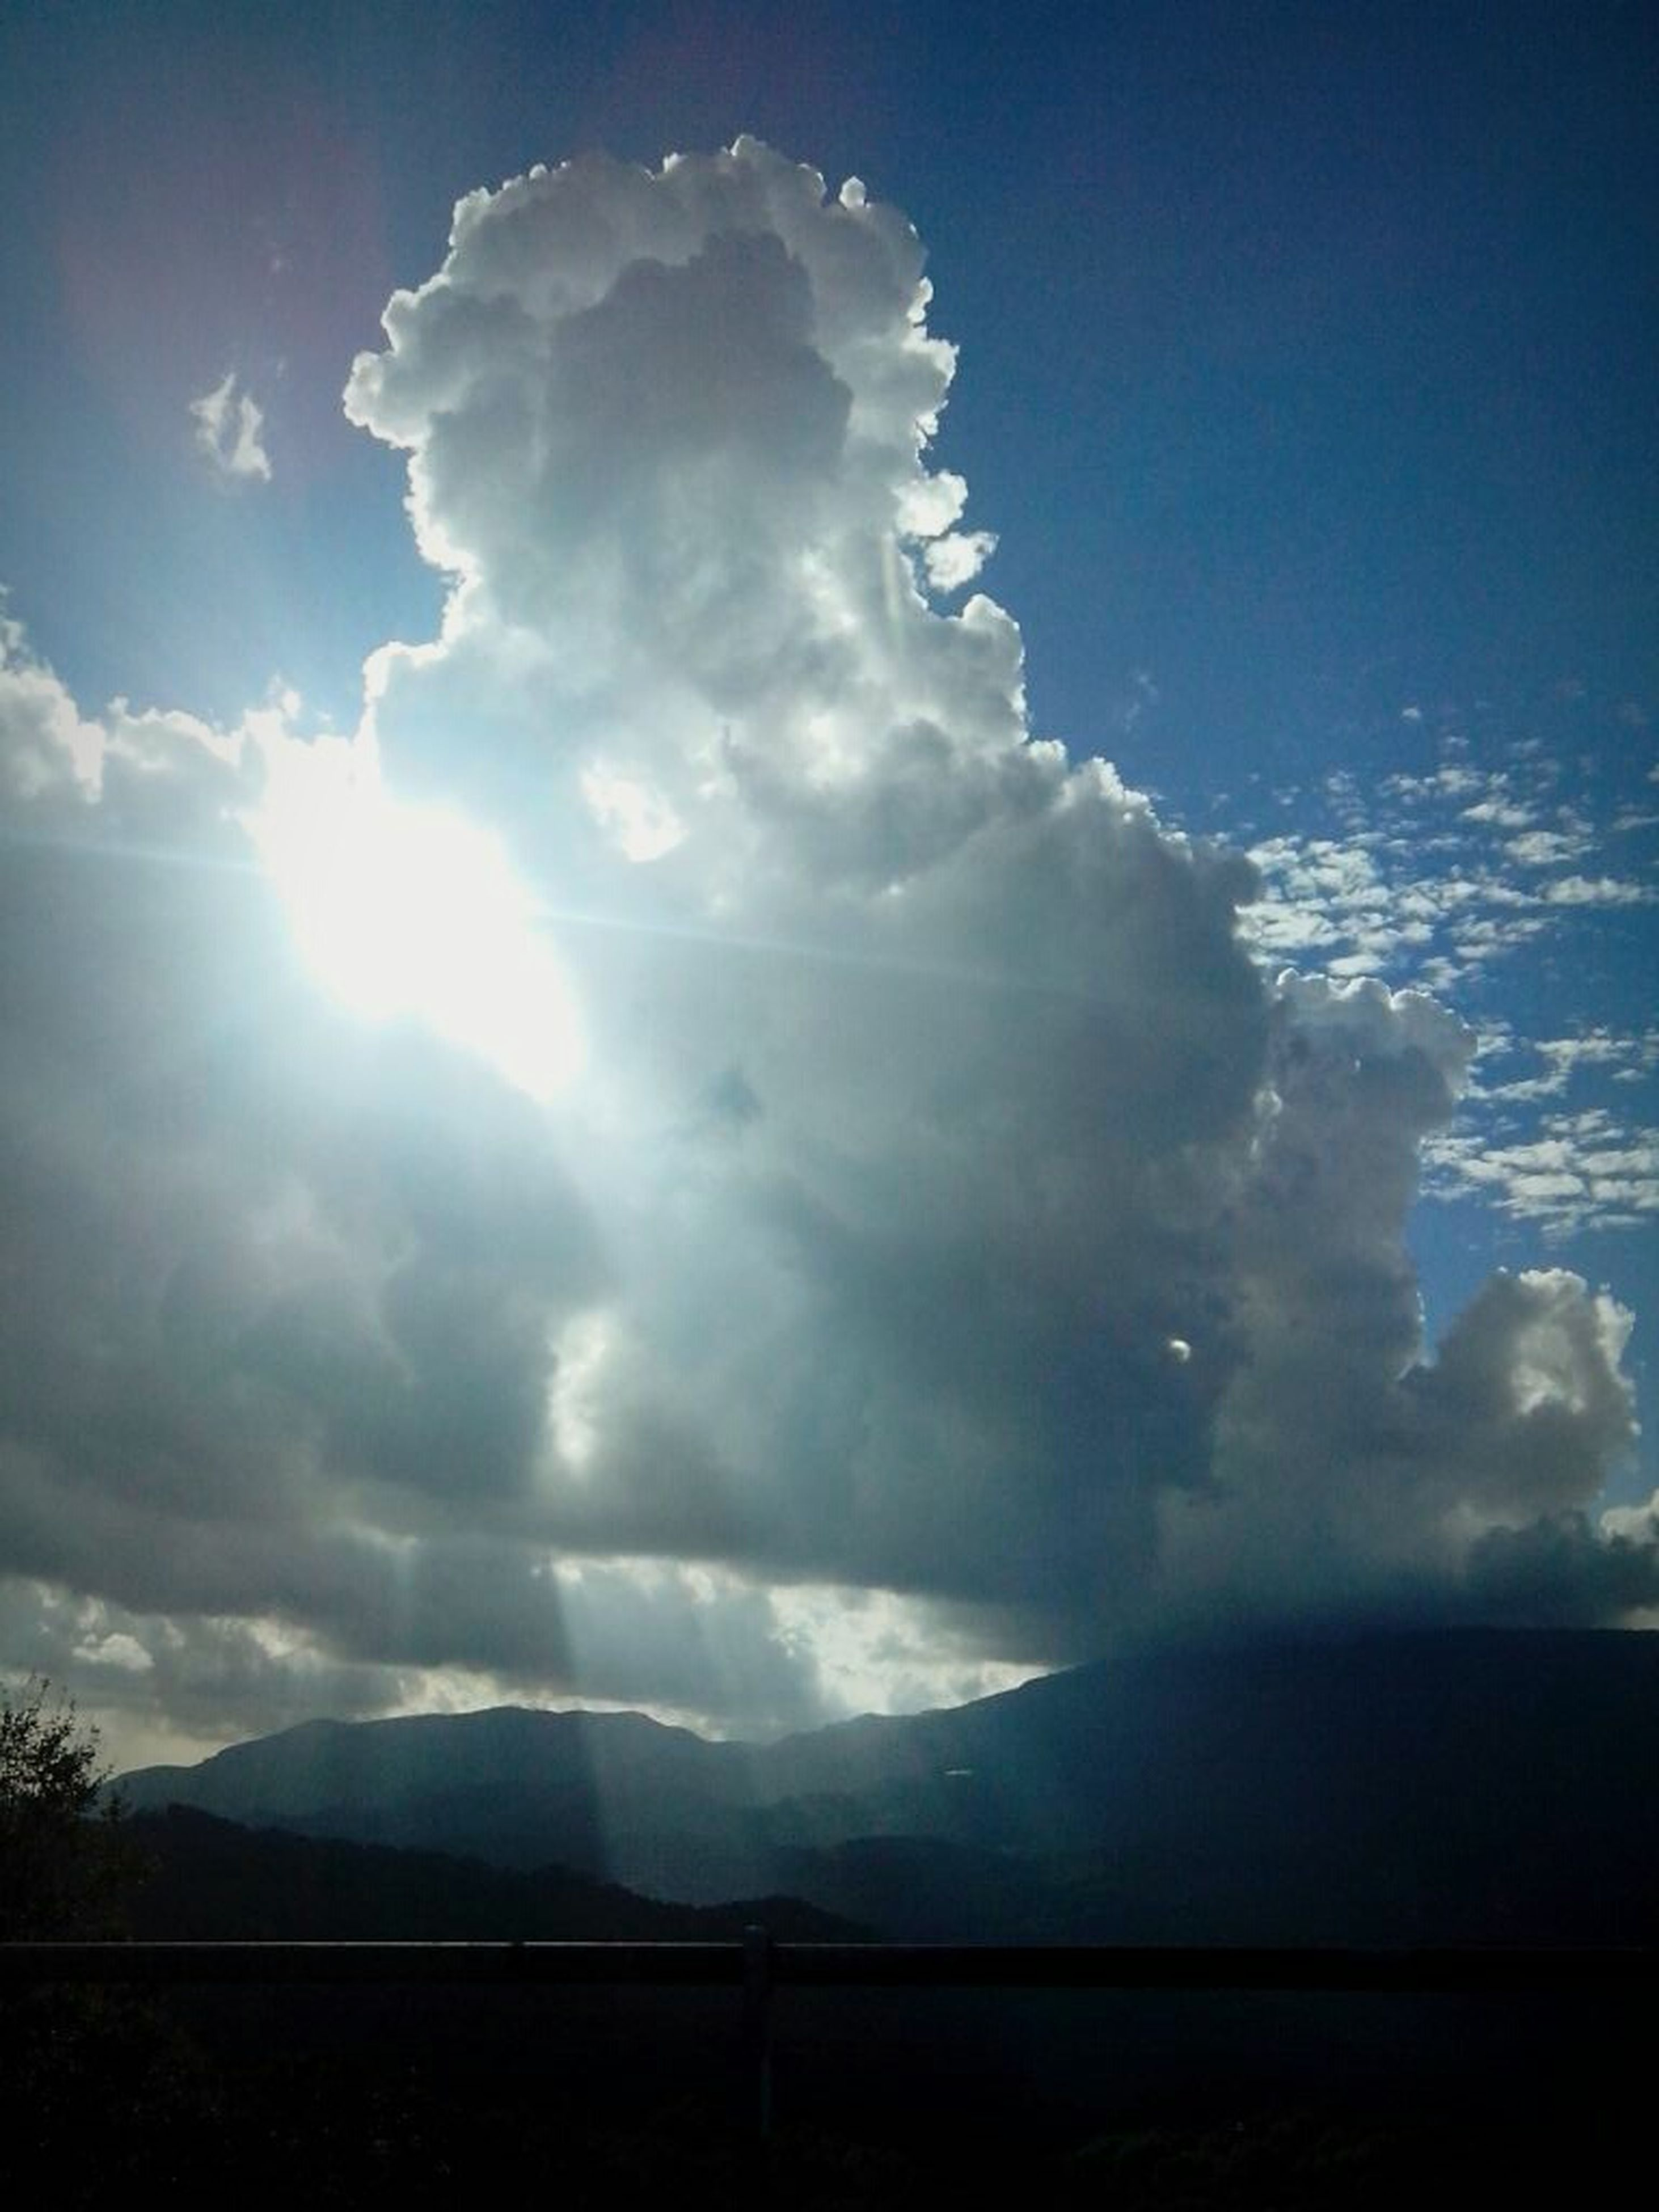 sky, tranquil scene, scenics, tranquility, beauty in nature, cloud - sky, sunbeam, nature, sun, mountain, landscape, cloud, silhouette, sunlight, idyllic, blue, cloudy, mountain range, non-urban scene, majestic